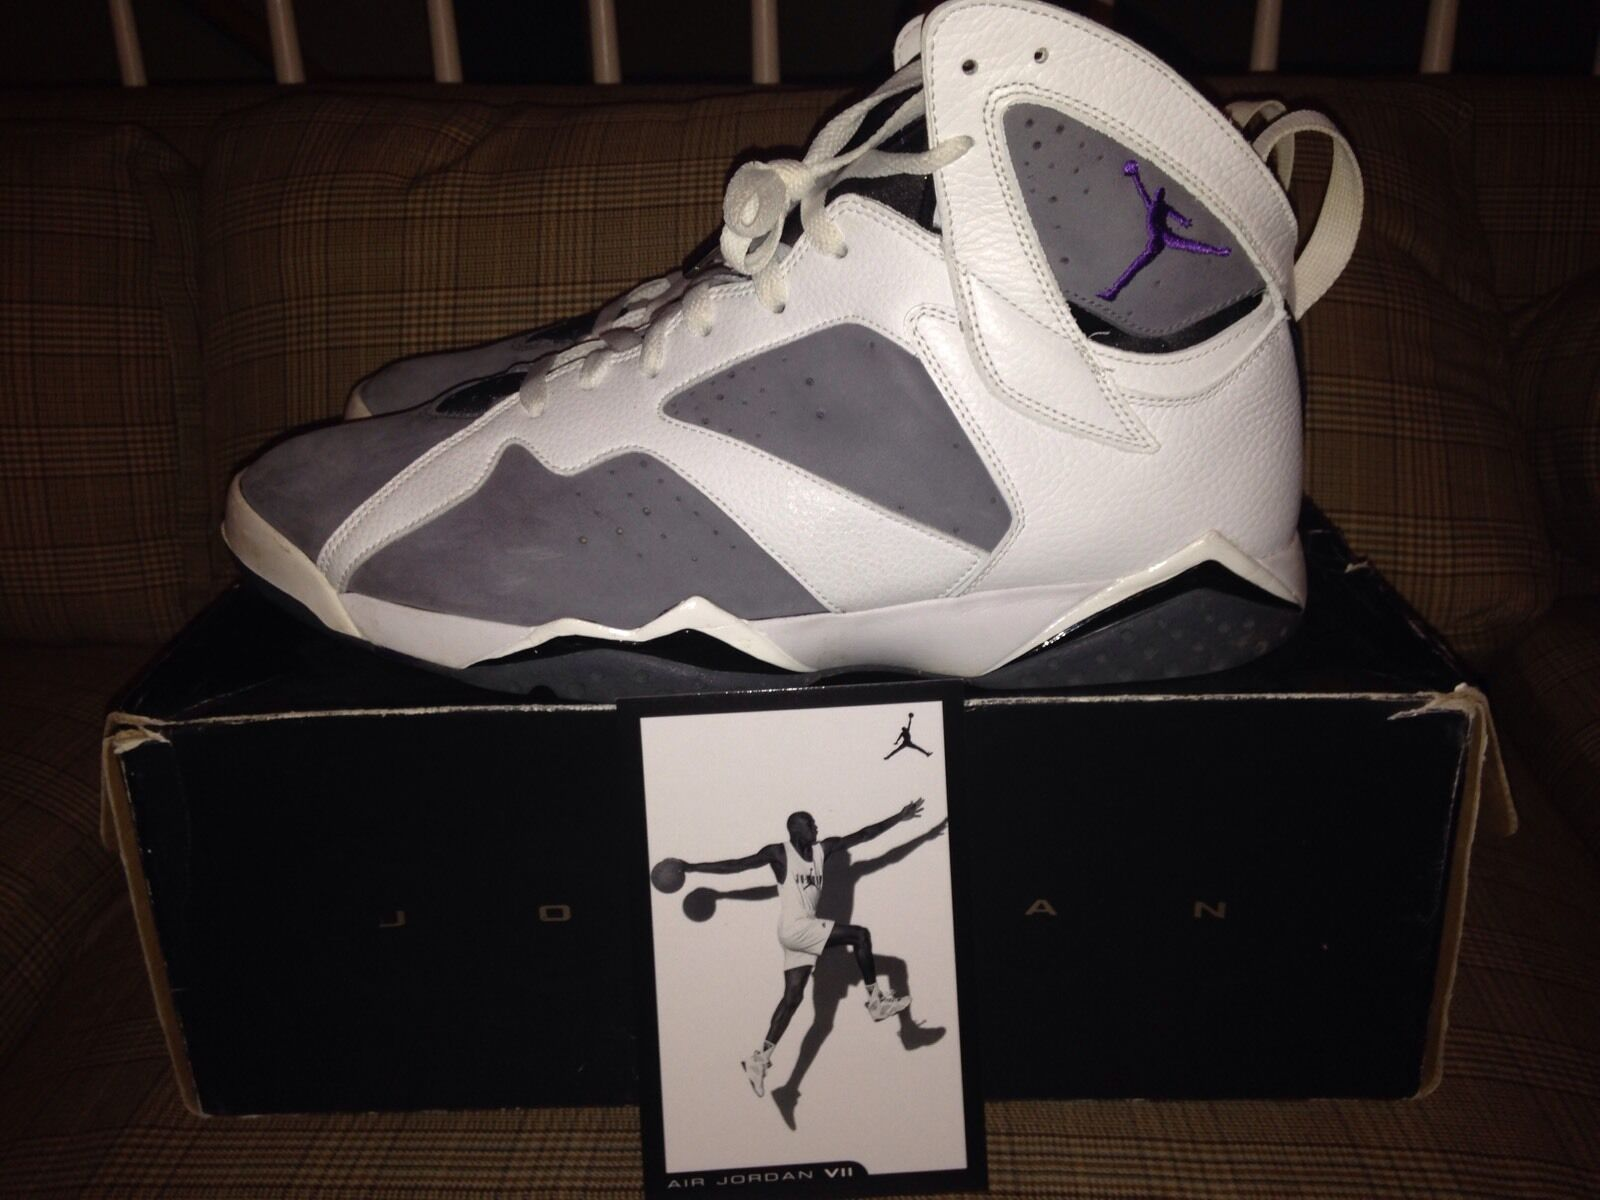 Nike Air Jordan 7 Retro Varsity Purple Flint Grey Basketball Shoes Comfortable Brand discount